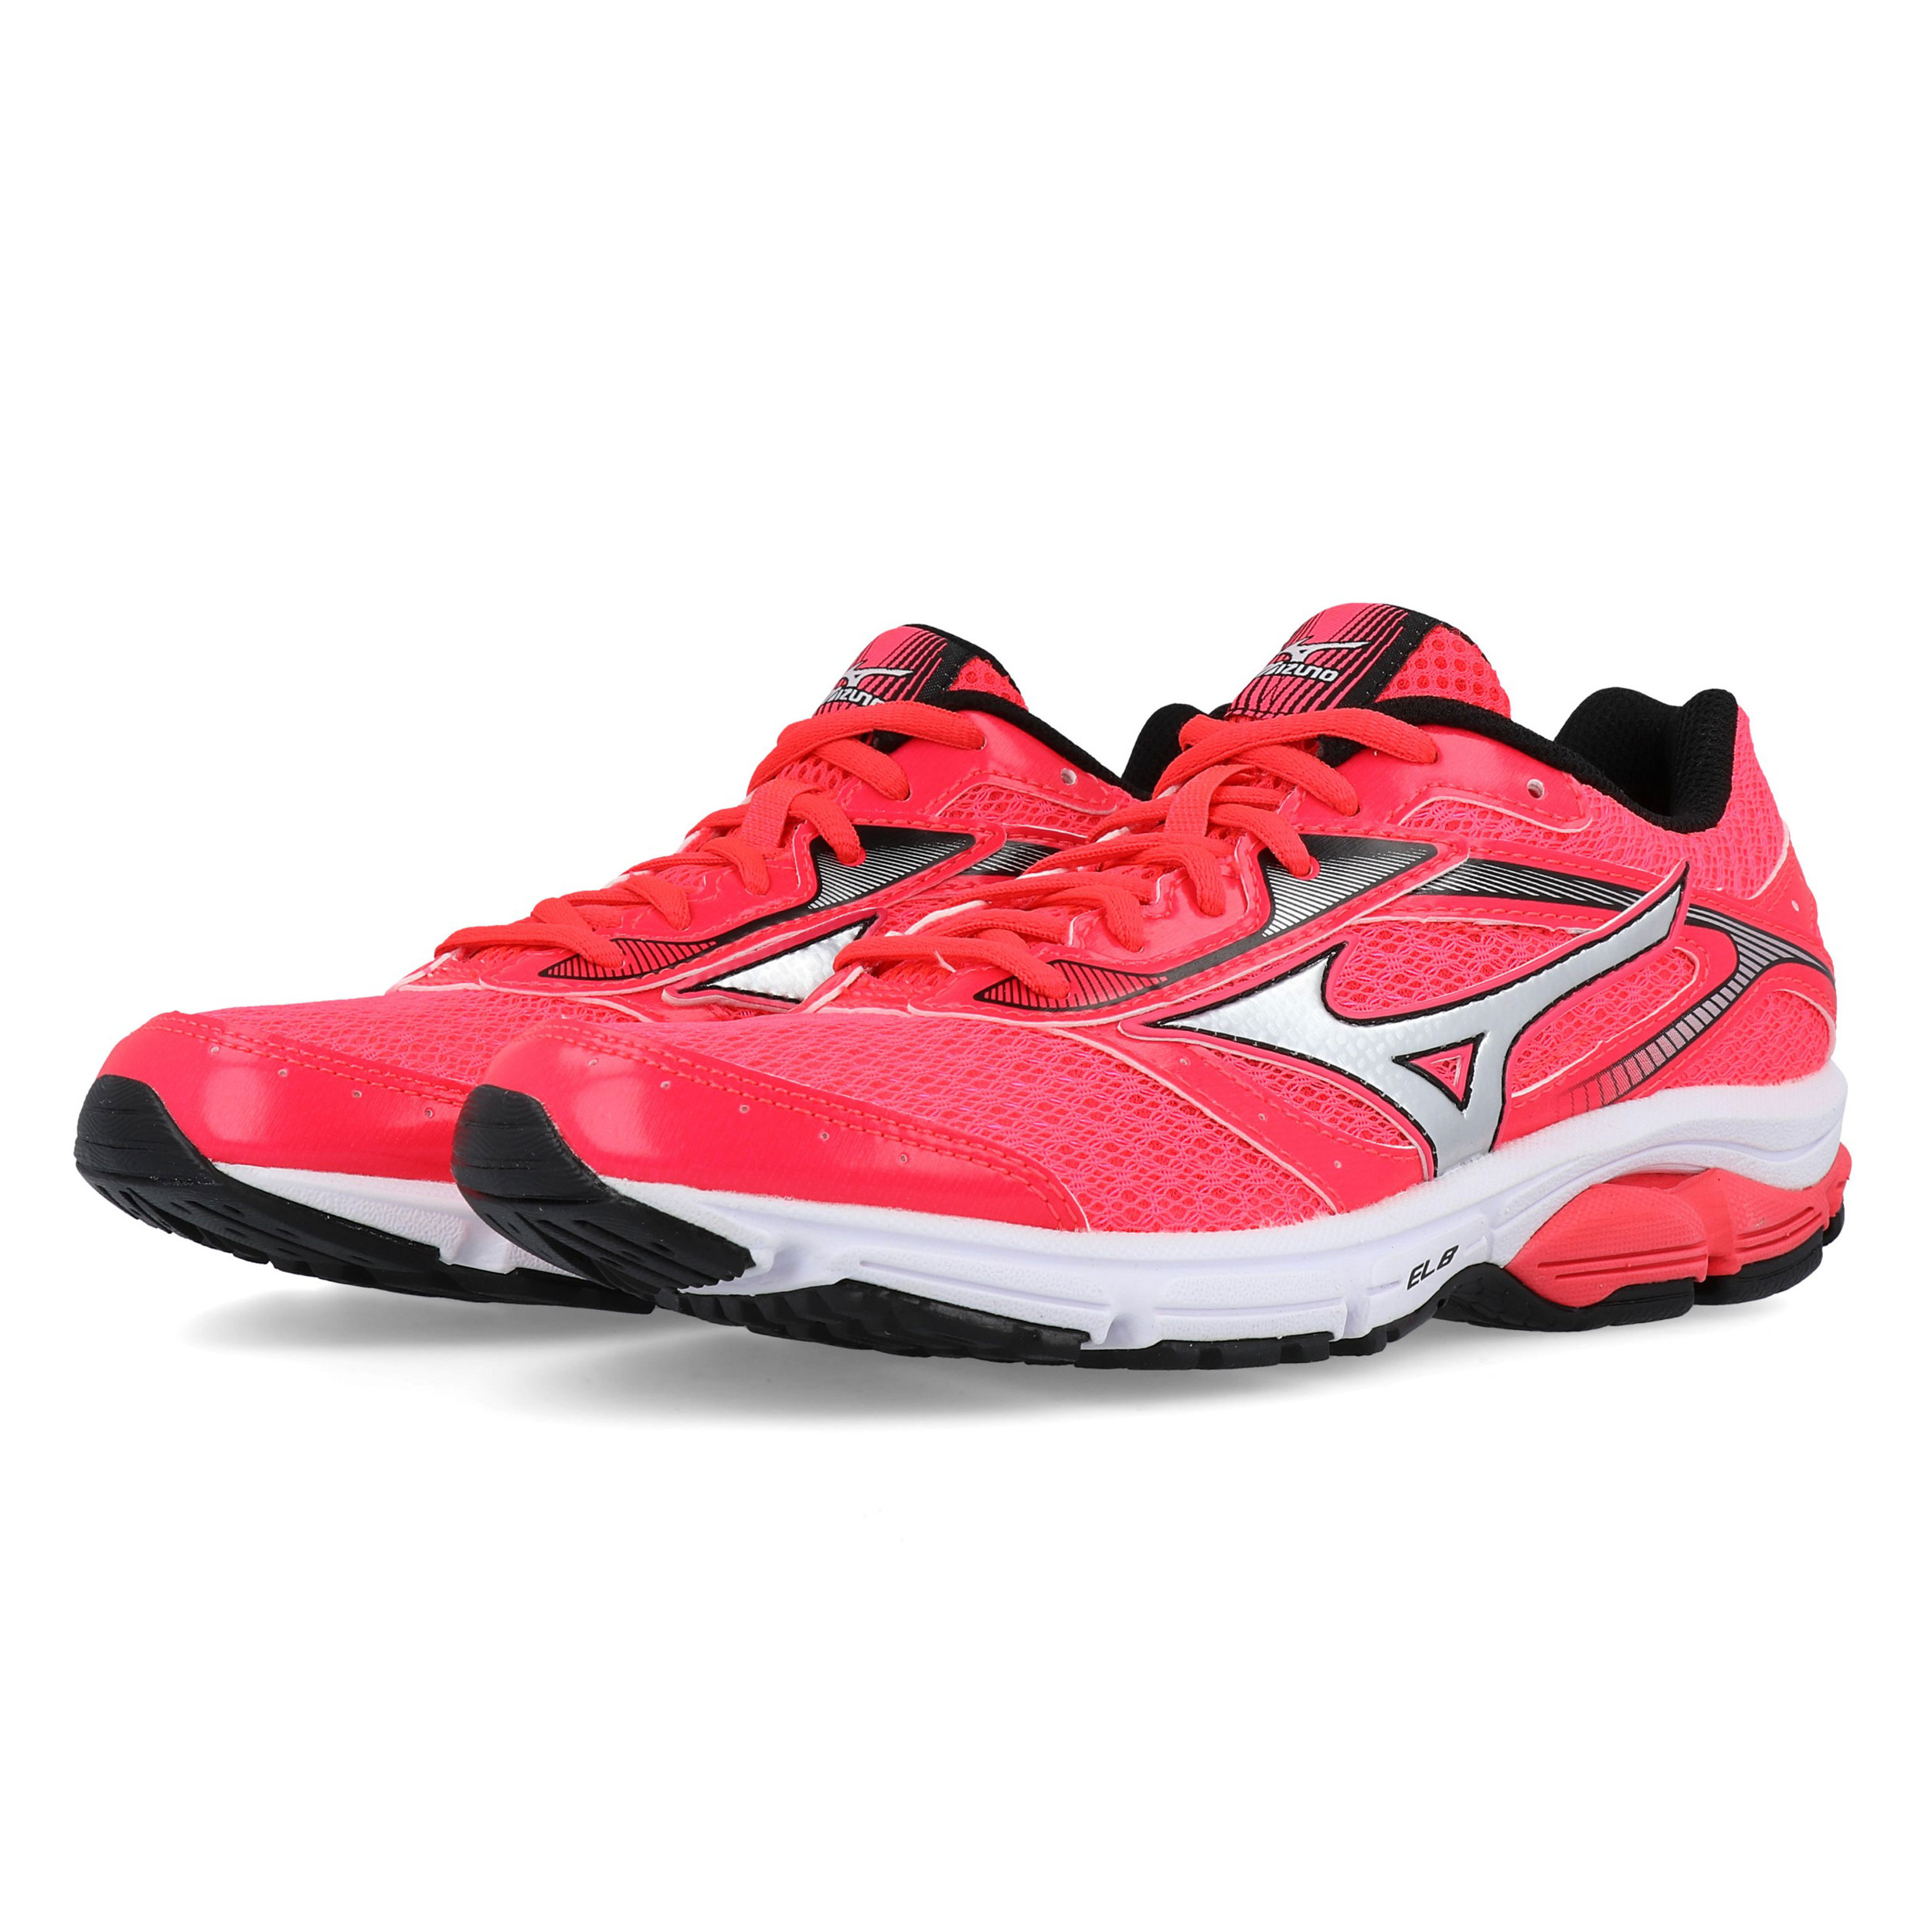 myynti verkossa paras arvo klassinen tyyli Details about Mizuno Womens Wave Impetus 4 Running Shoes Trainers Pink  Sports Breathable